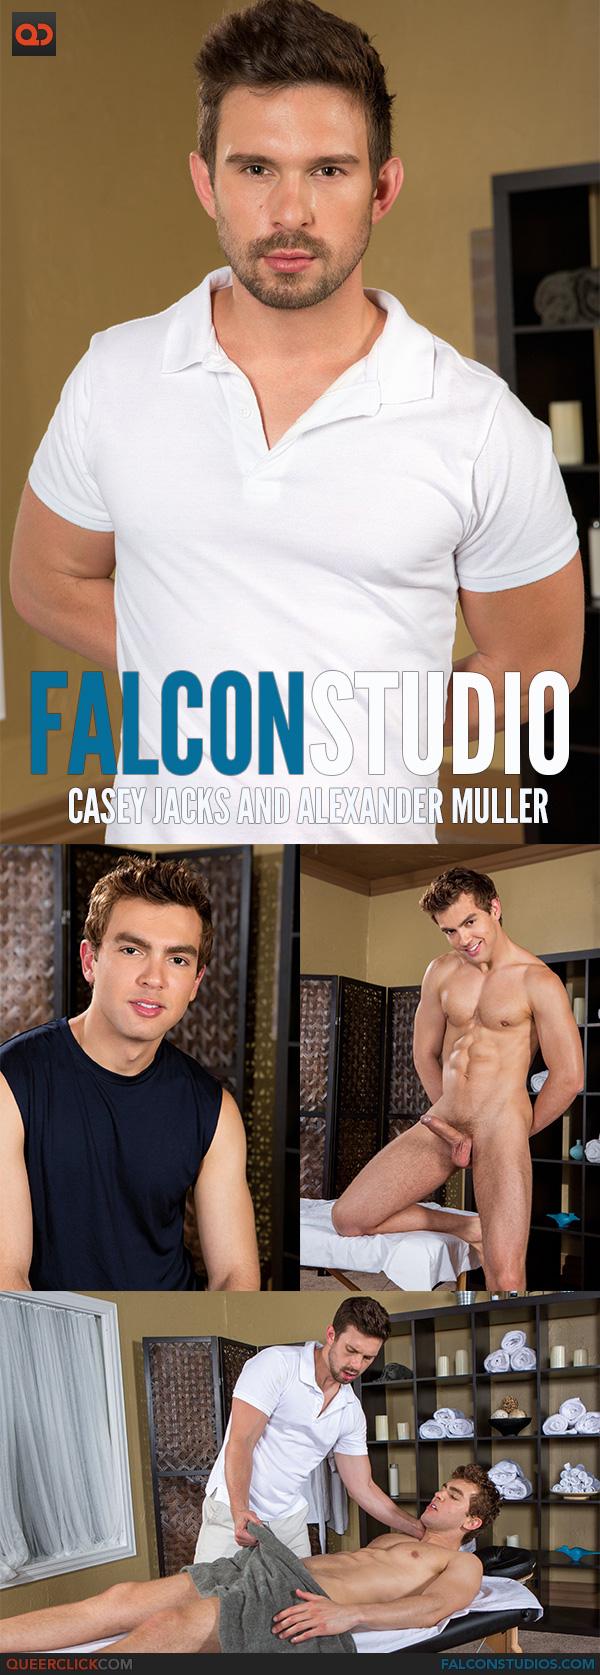 Falcon Studios: Casey Jacks and Alexander Muller